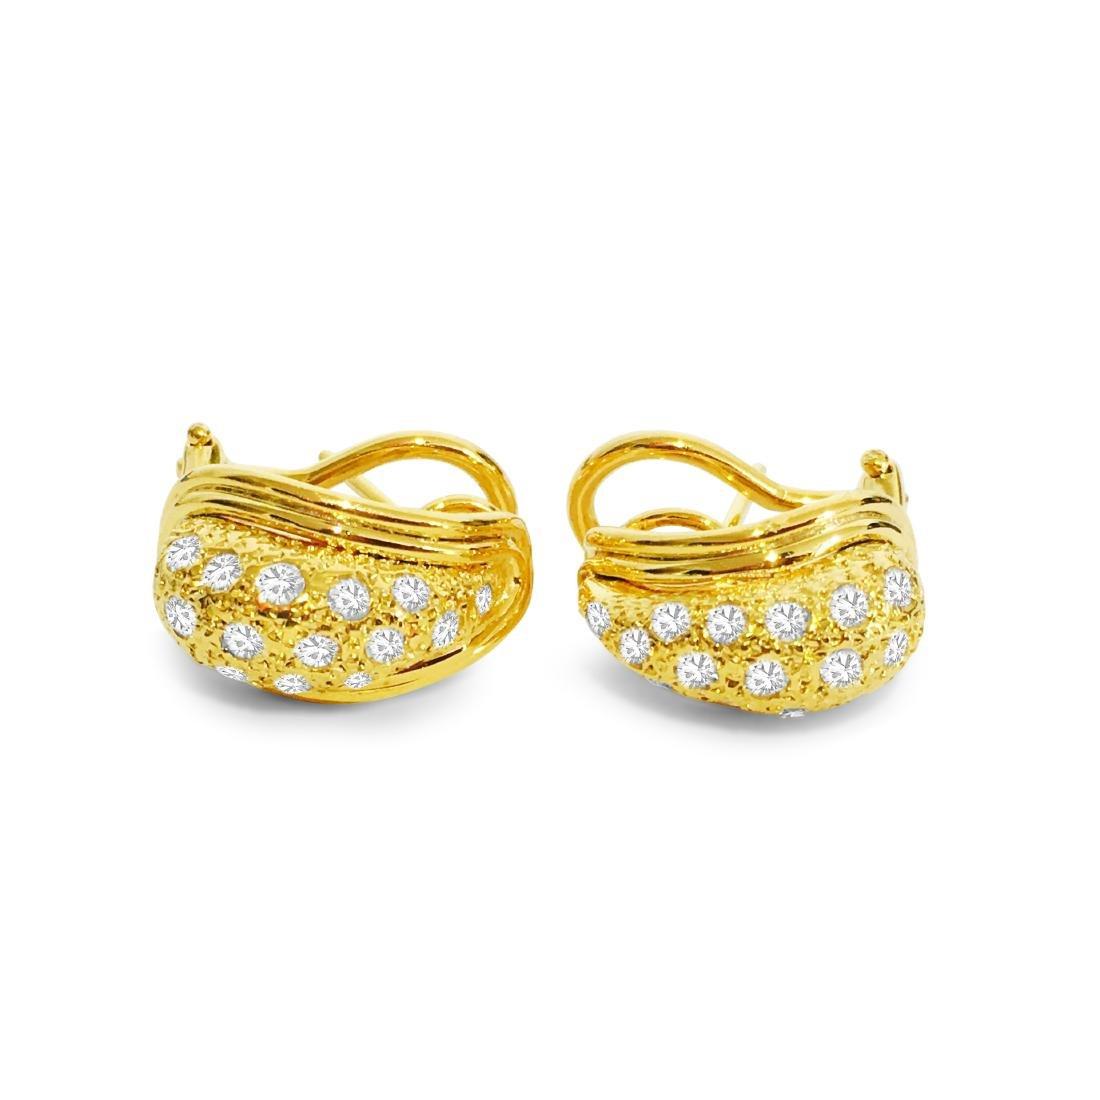 14K Yellow Gold, 1.00 CT Diamond Earrings - 4